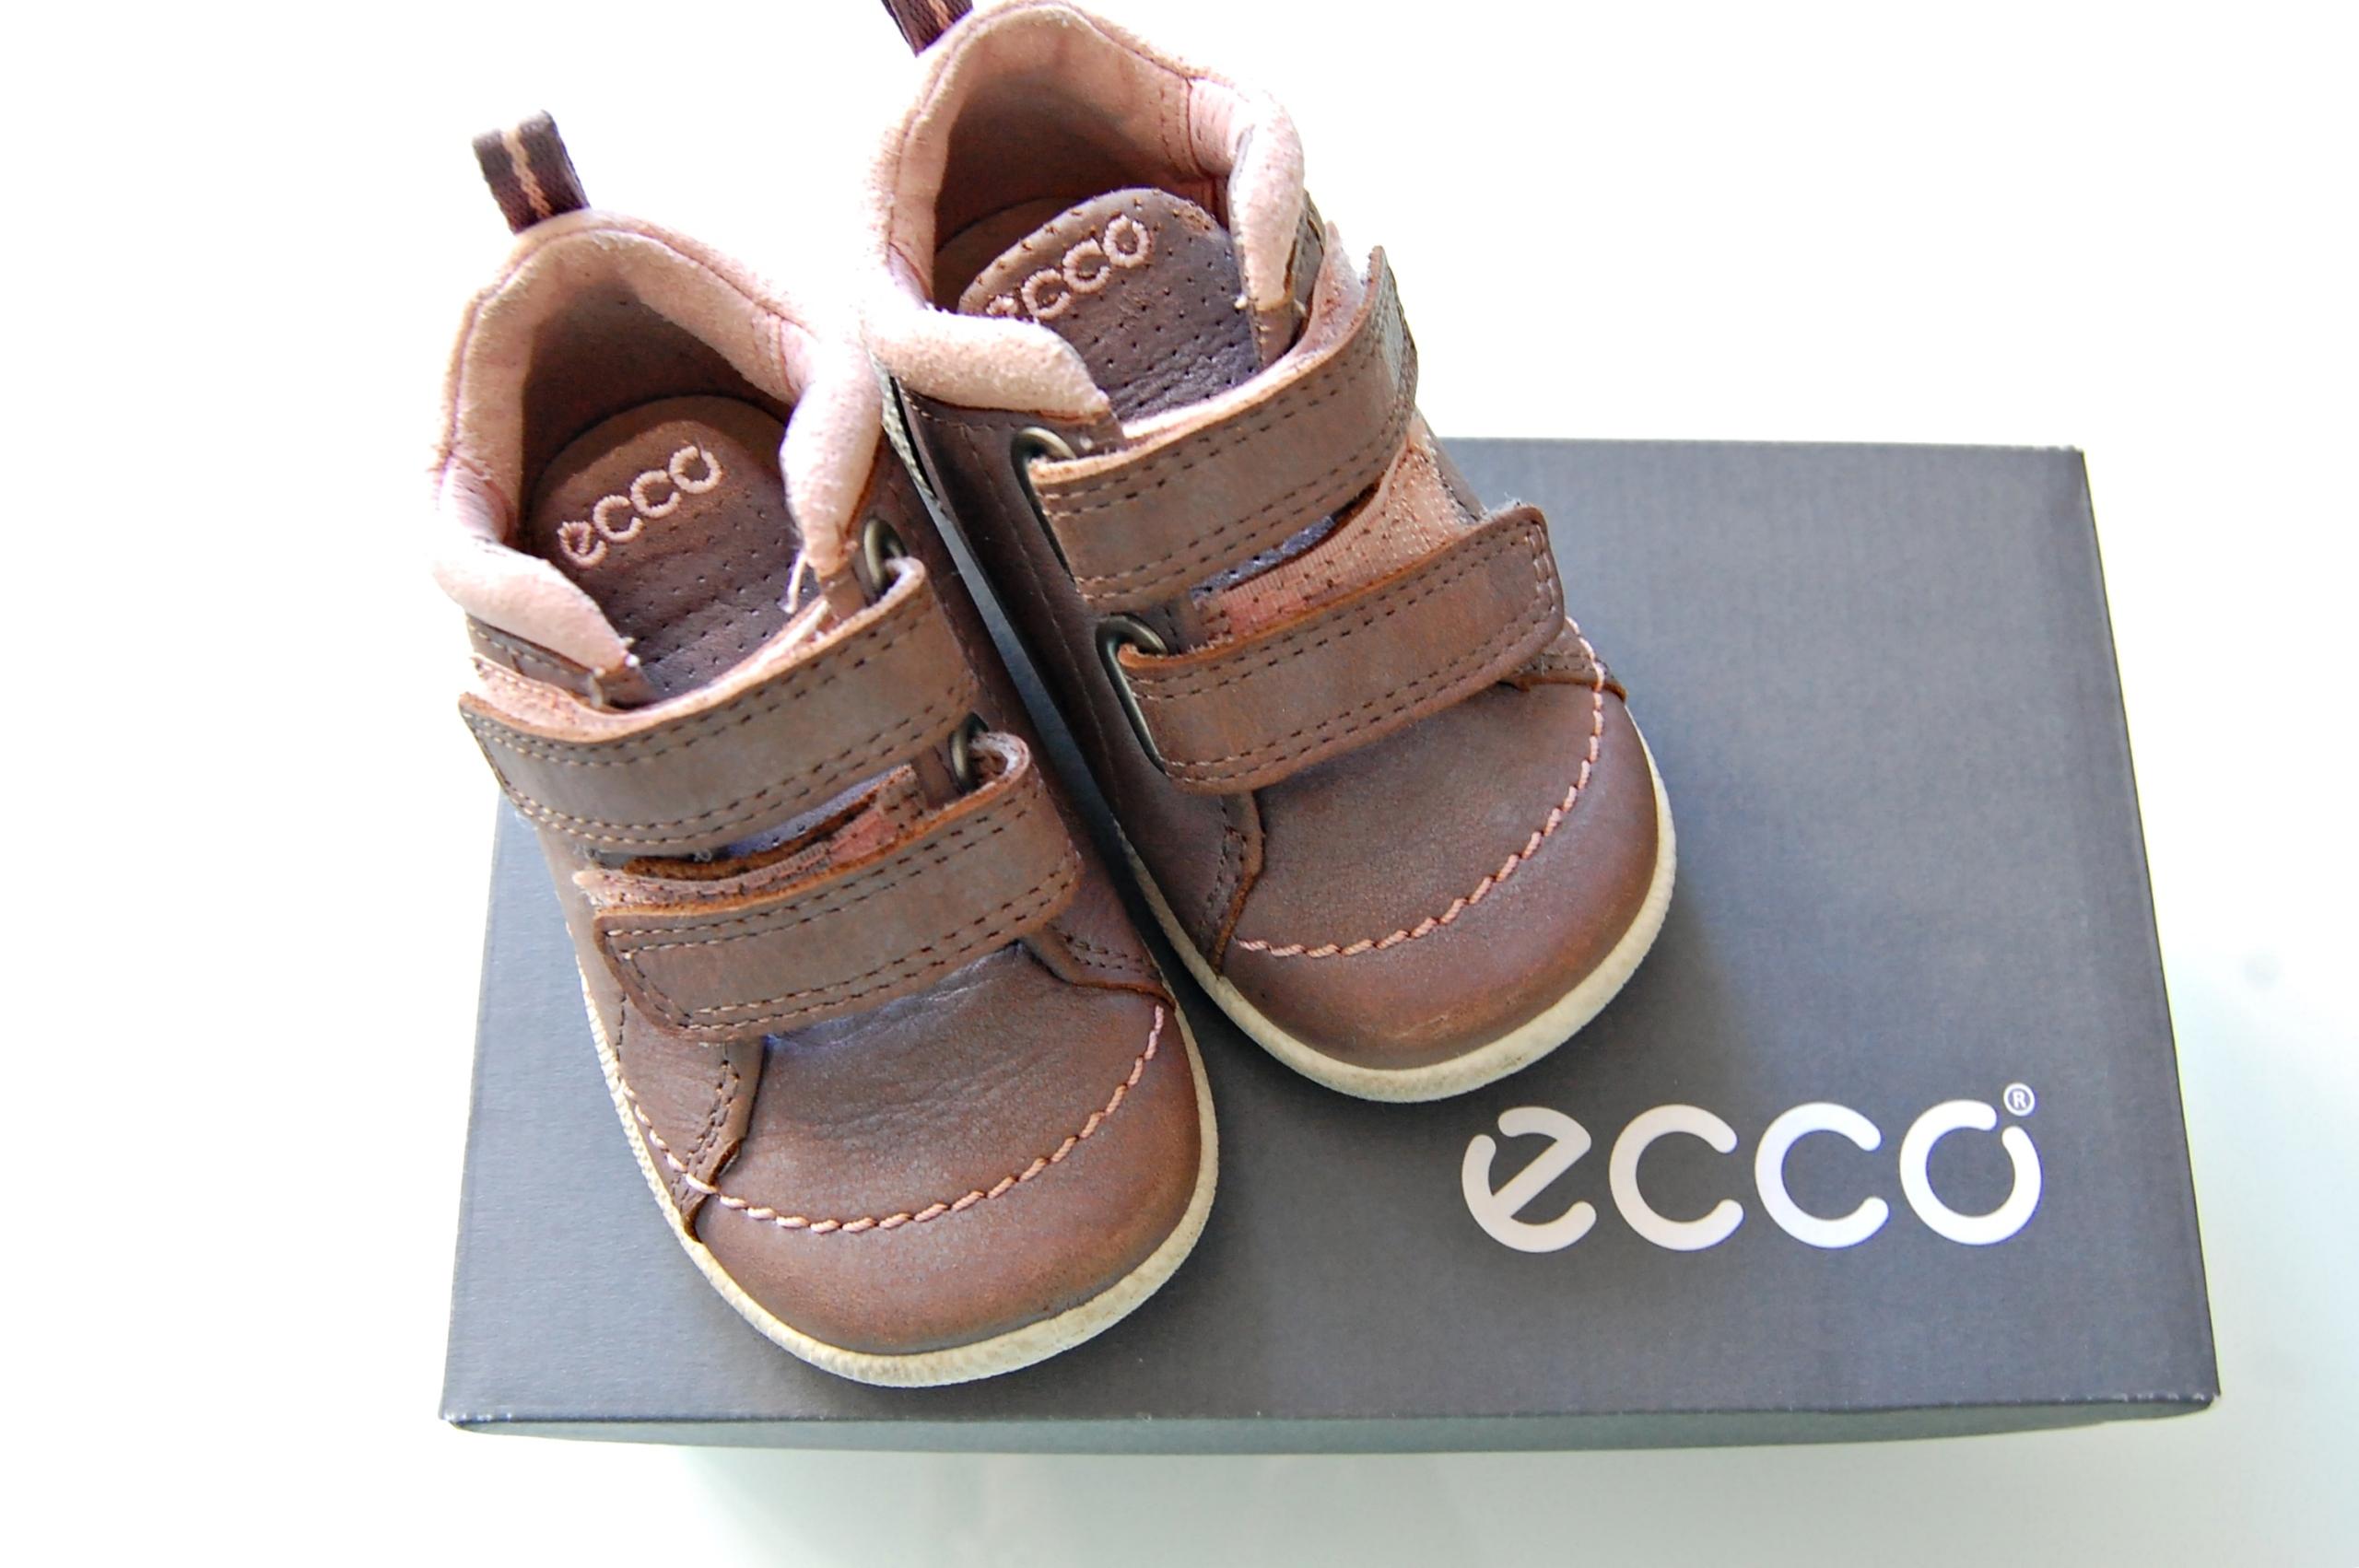 80624e44 Buty ECCO BIOM r. 19 do nauki chodzenia stan bdb - 7540231235 ...